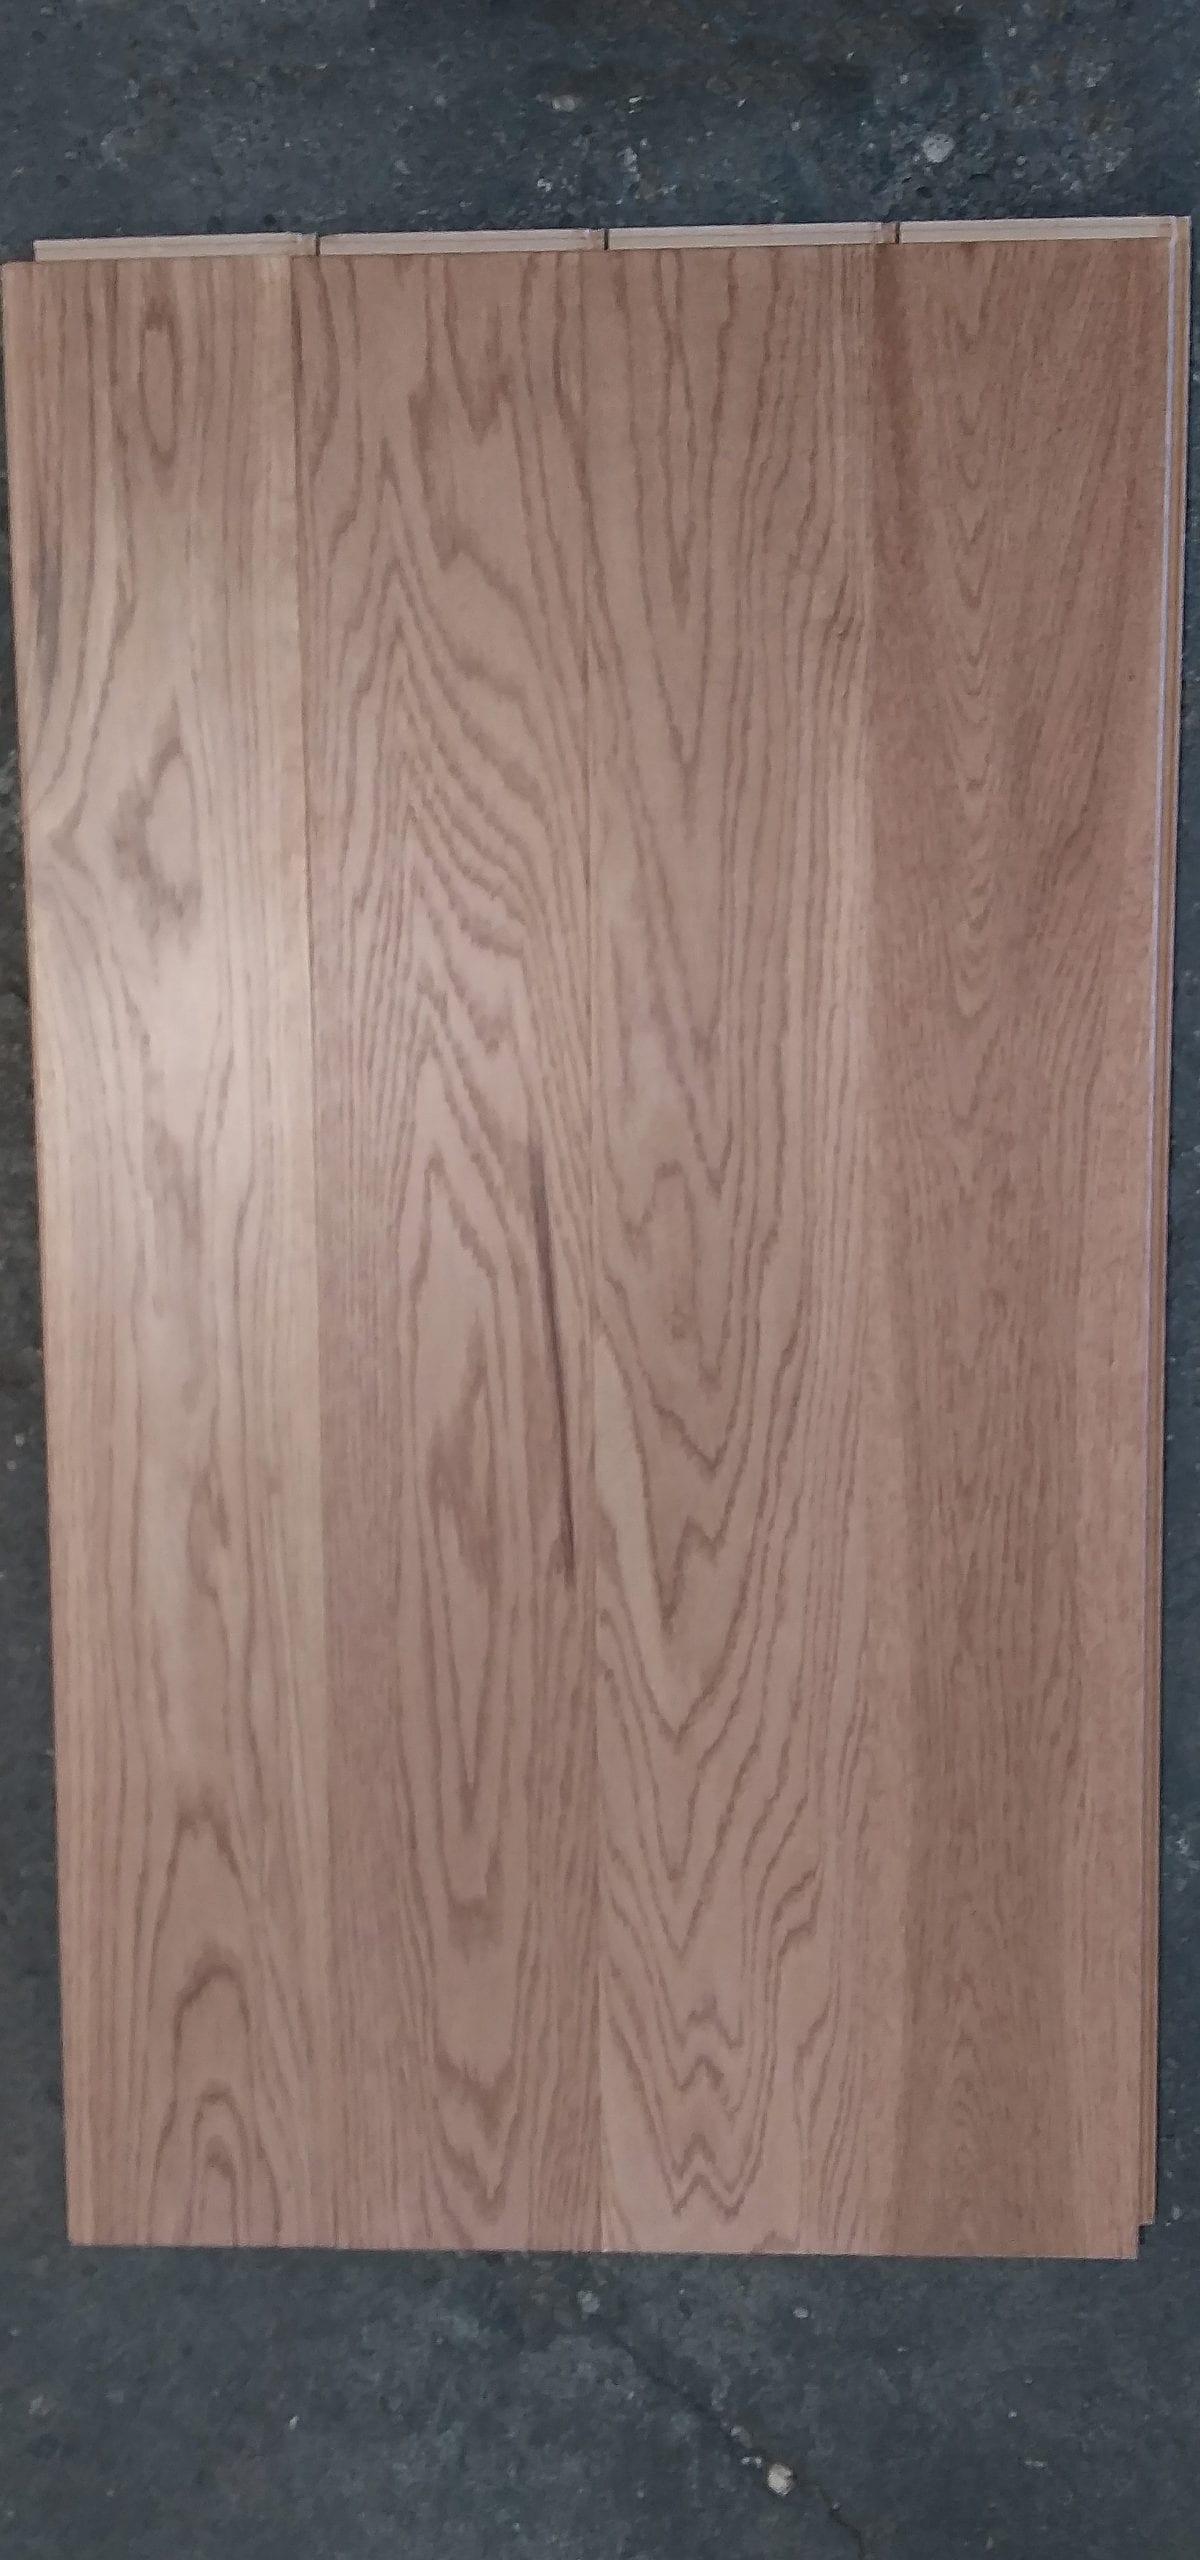 Newtown Click Engineered Hardwood_Santiago_33.90sf per carton_1.99